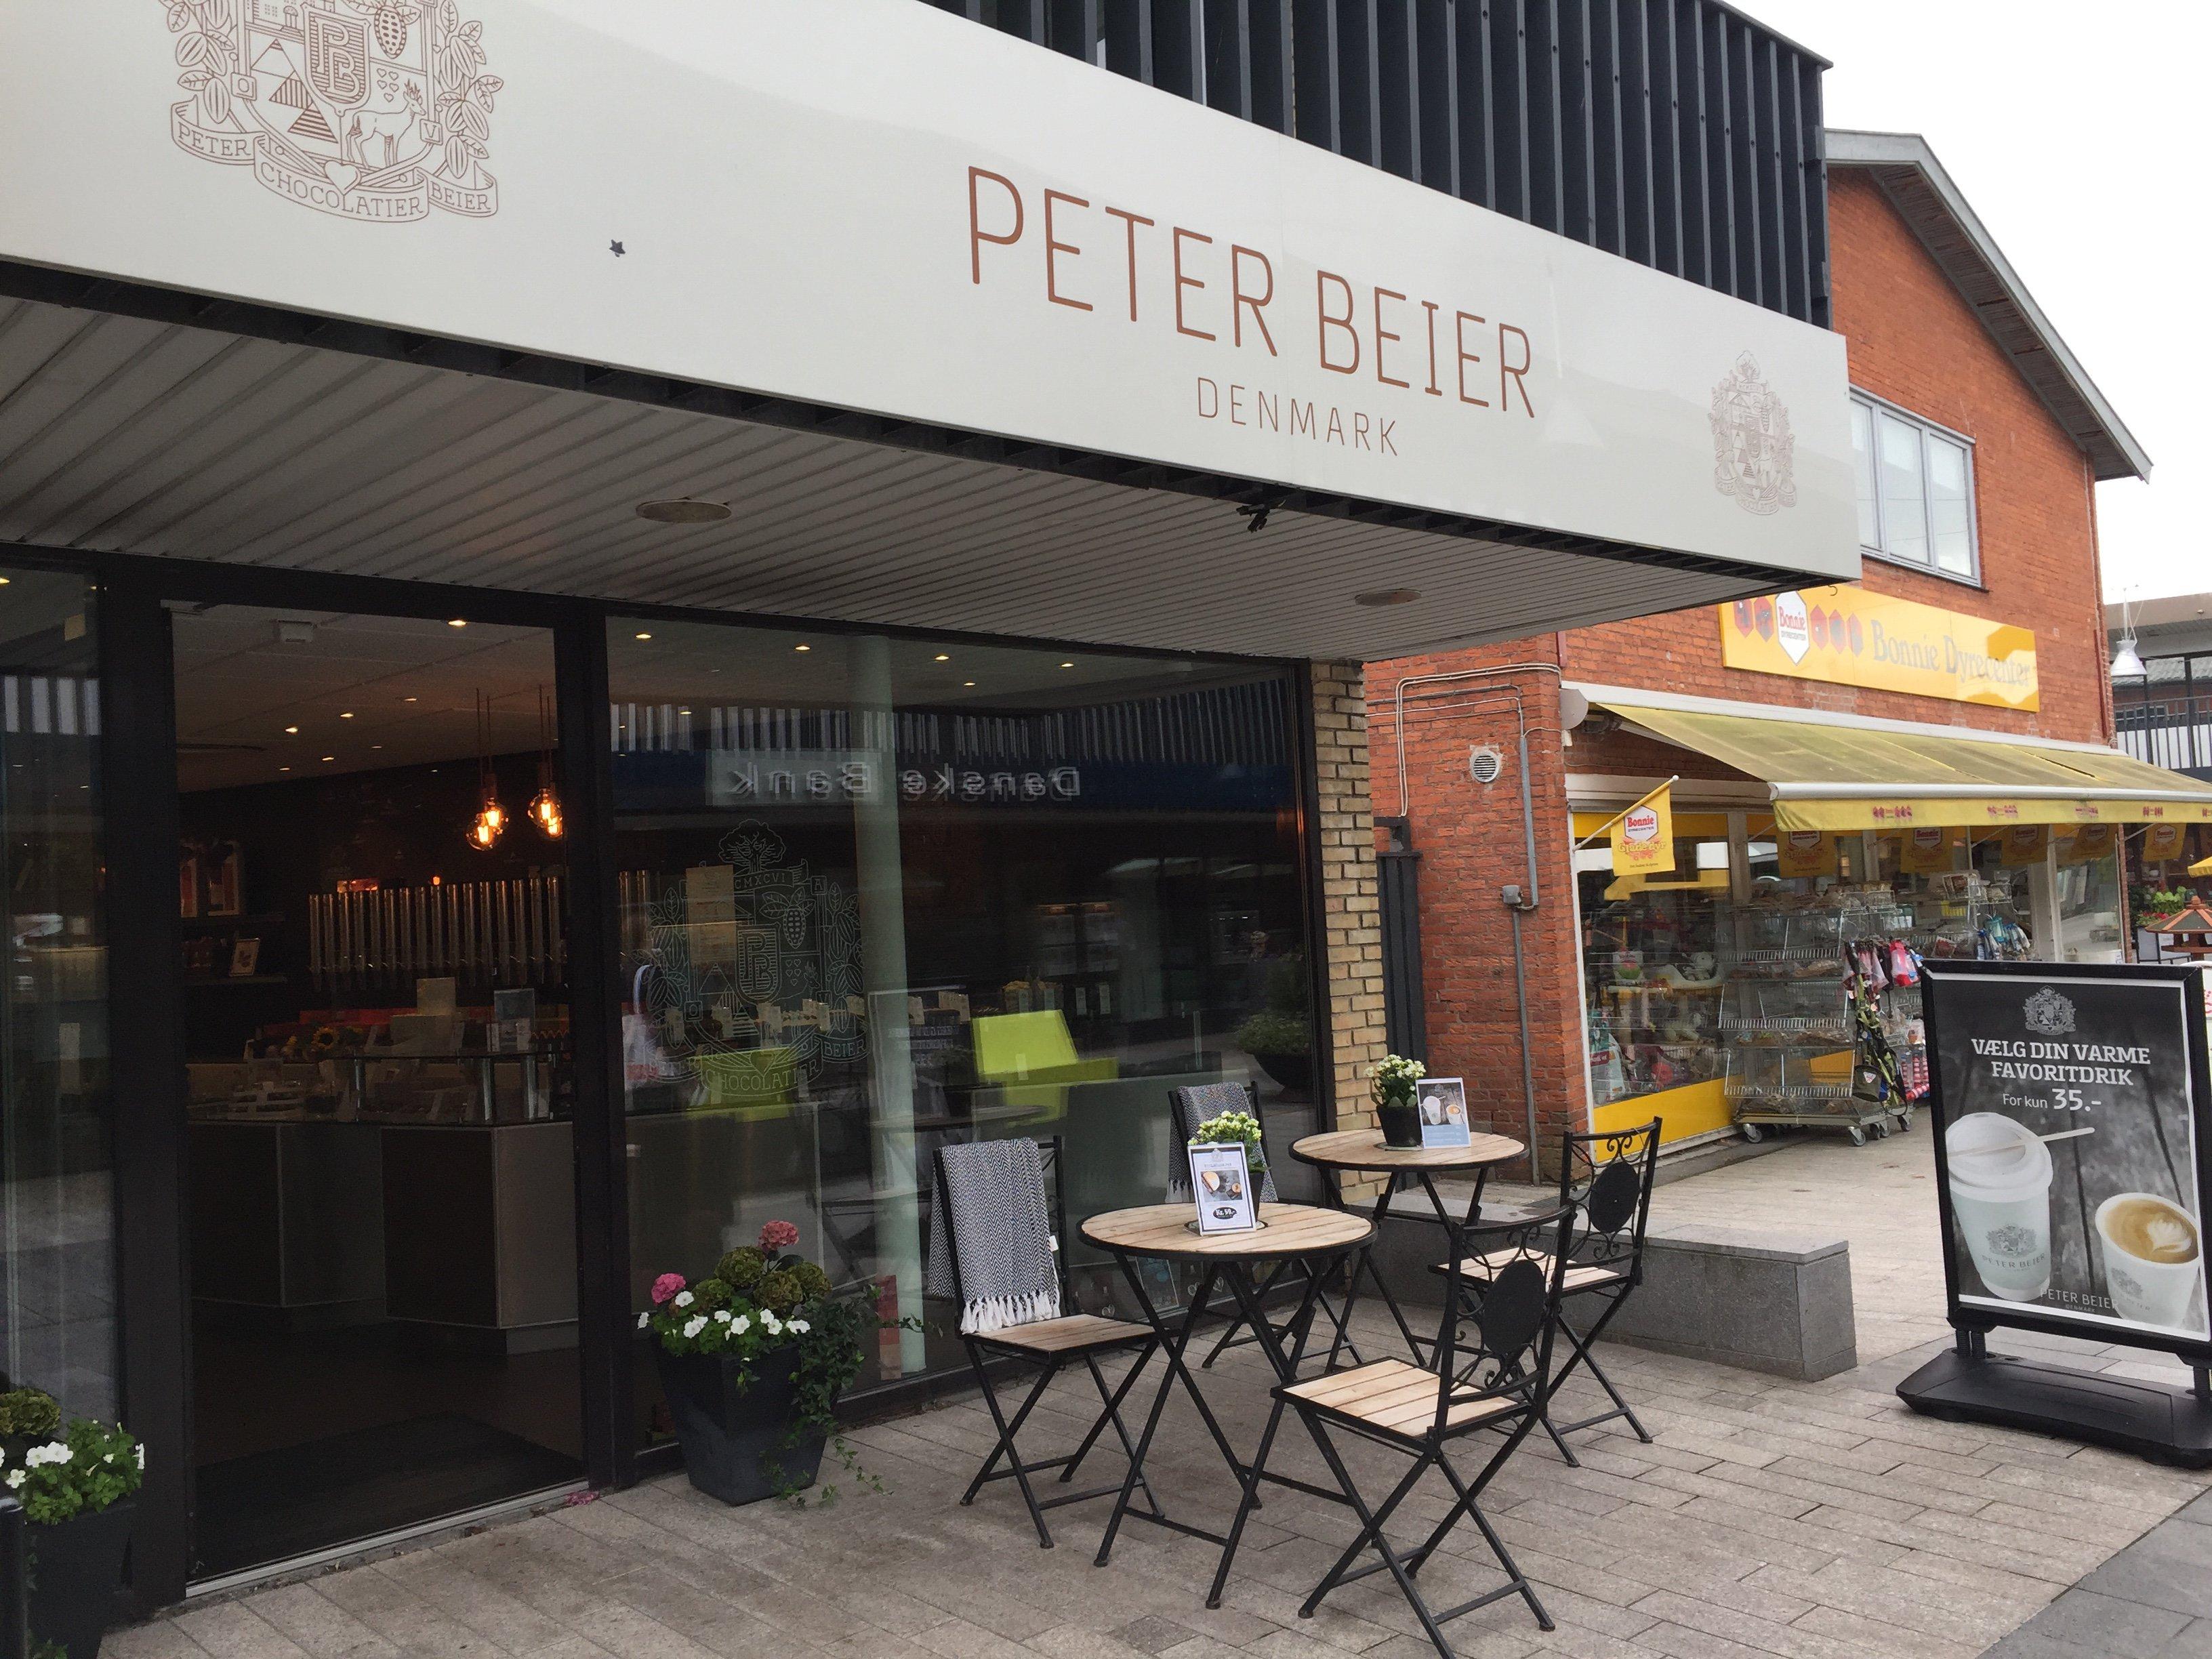 Peter Beier Chokolade udvider med cafébutik i Egedal Centret